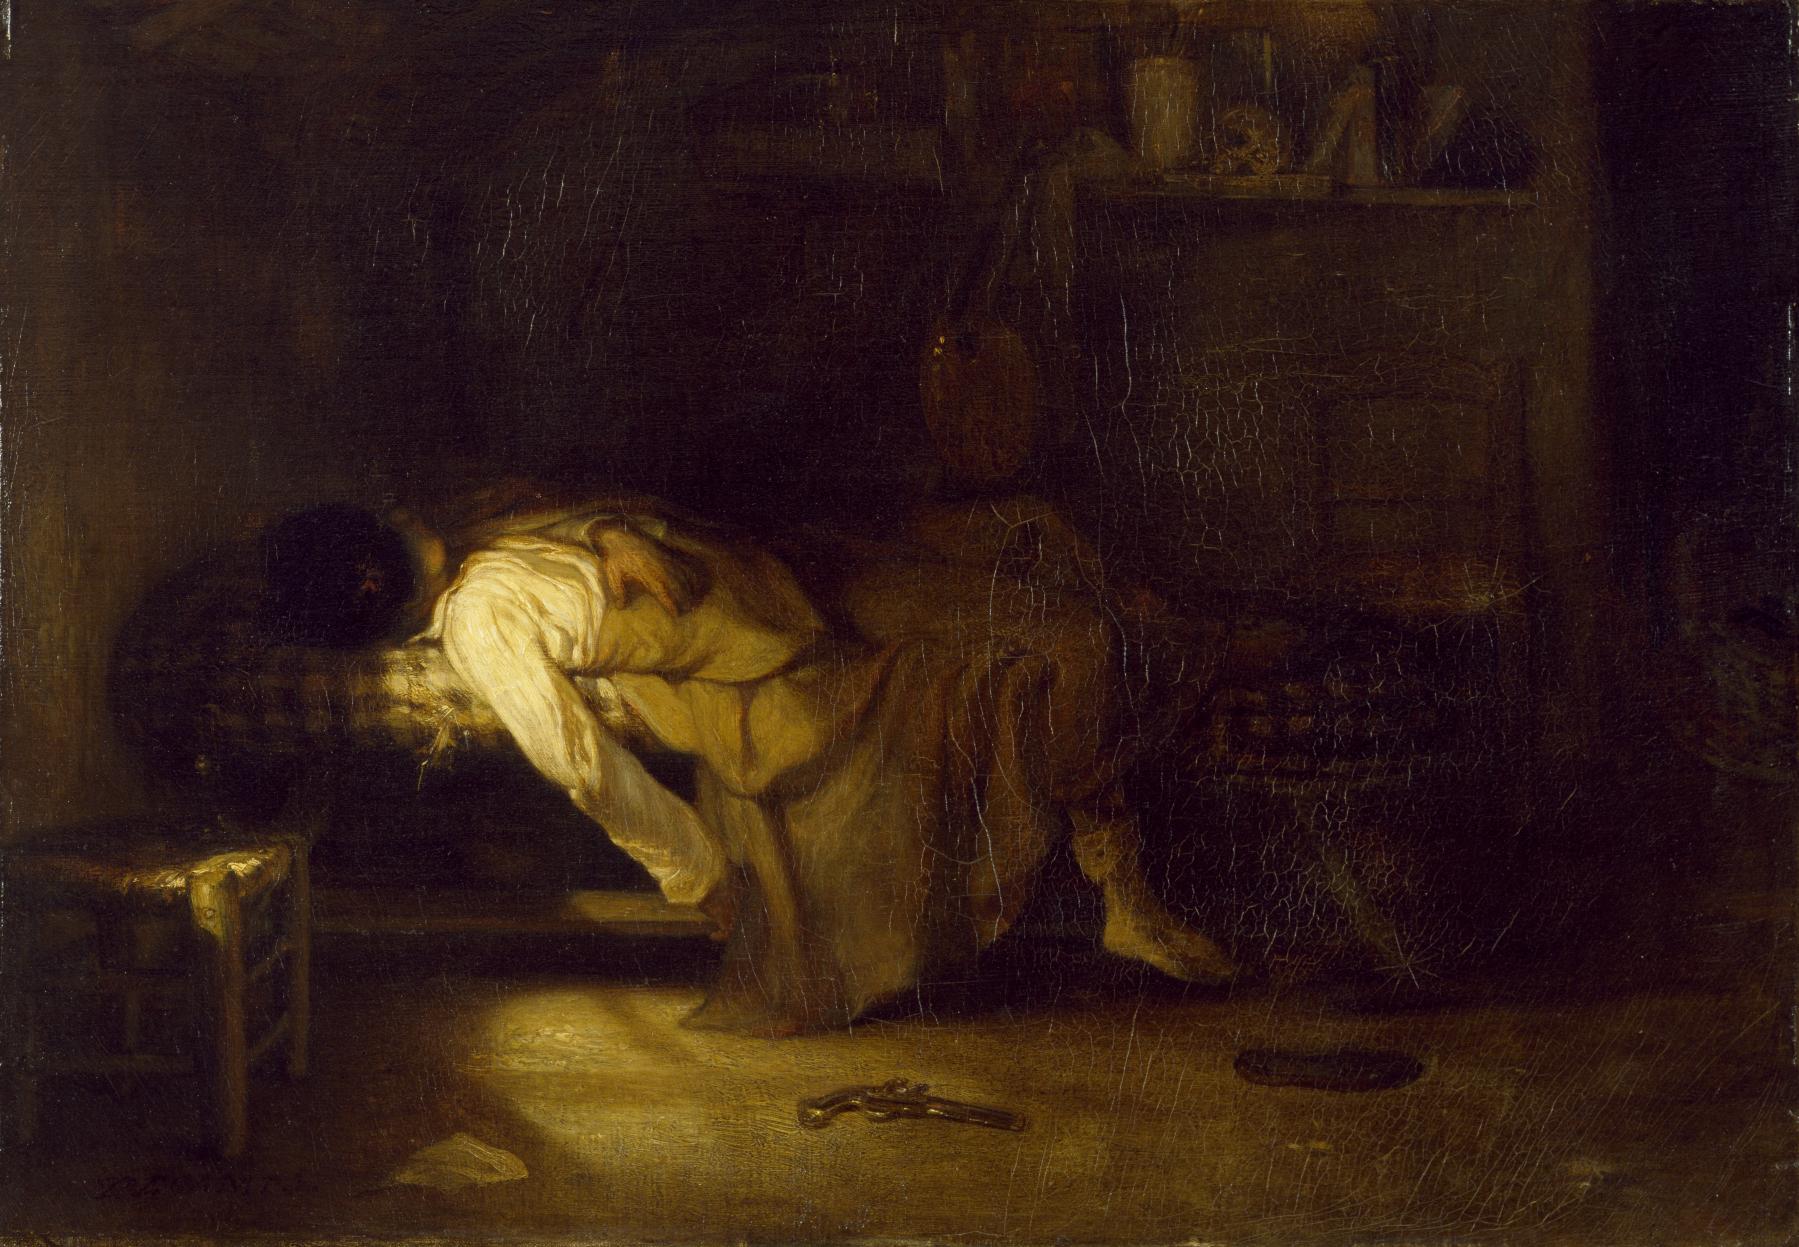 Alexandre-Gabriel_Decamps_-_The_Suicide_-_Walters_3742